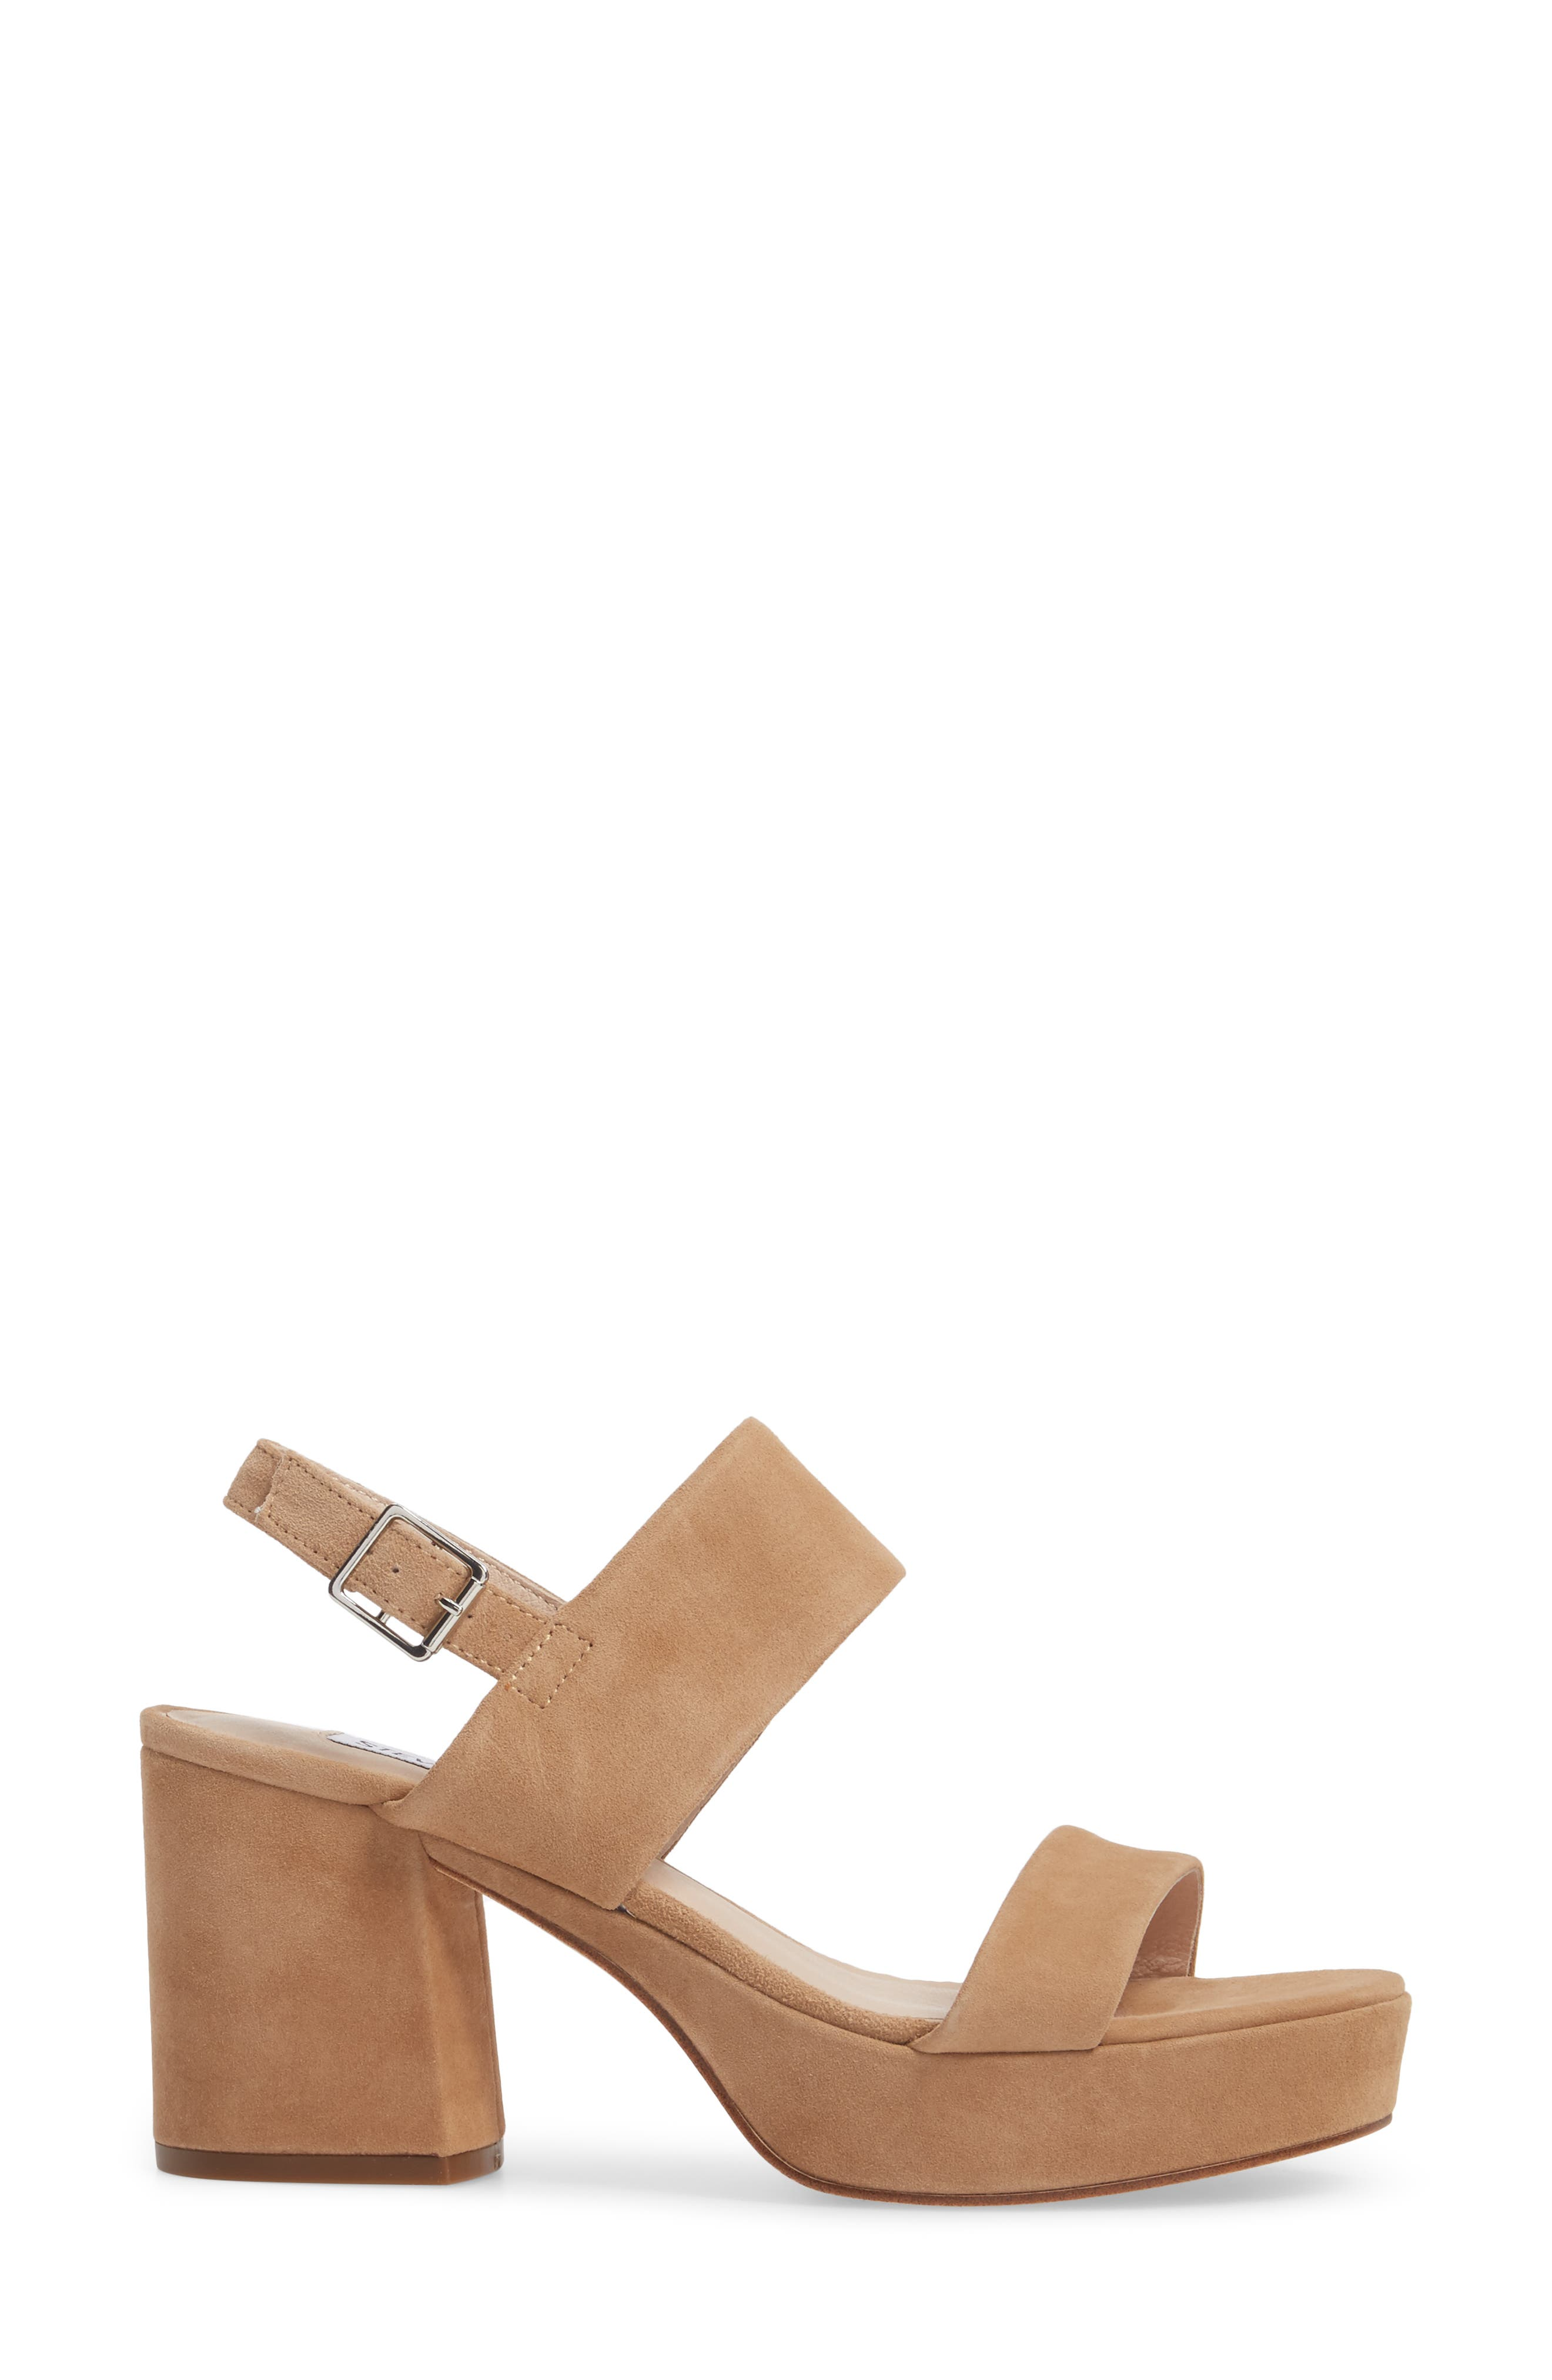 Reba Slingback Platform Sandal,                             Alternate thumbnail 3, color,                             TAN SUEDE